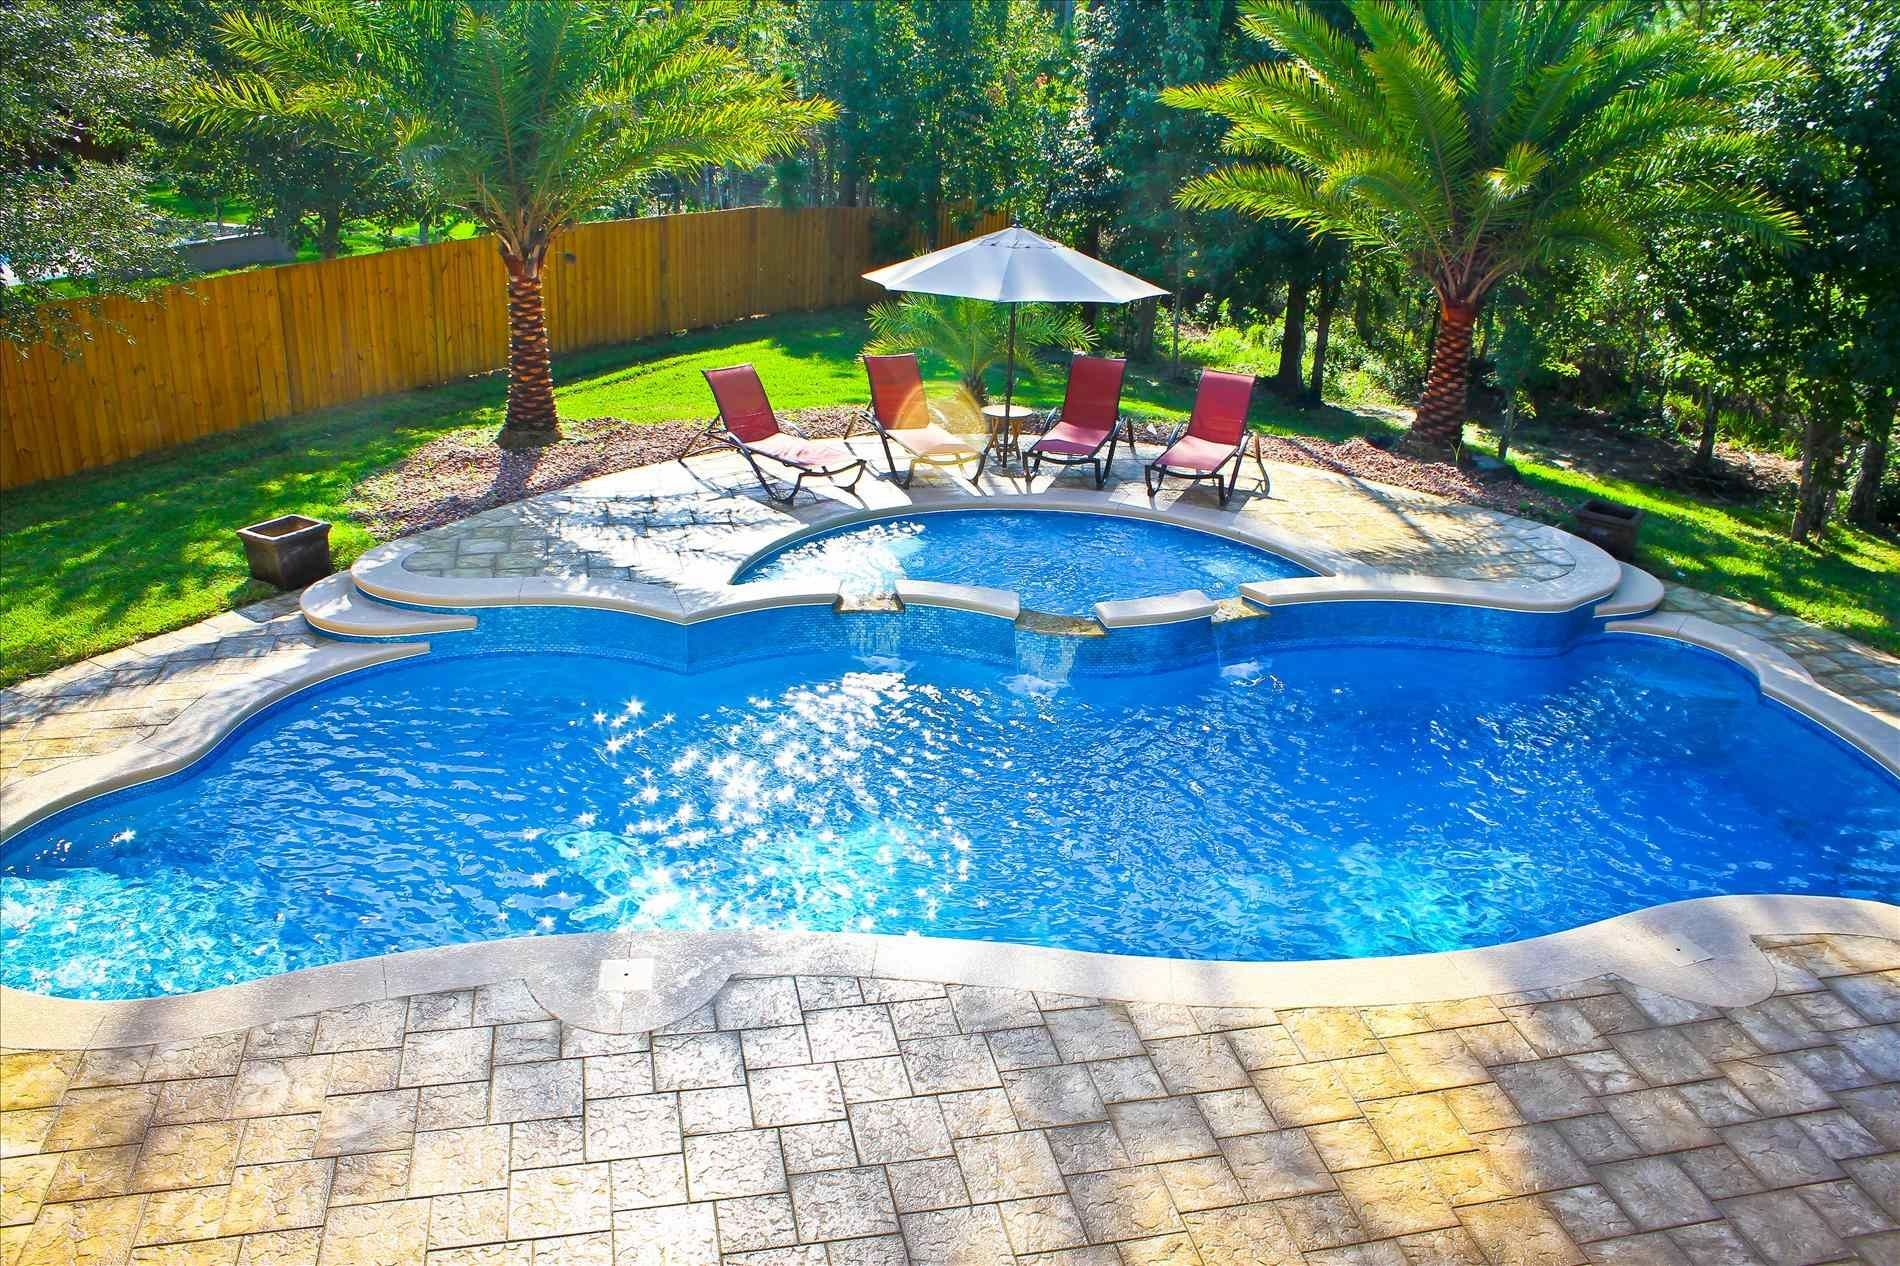 Pool Hot Tub Combo Prices Savewallpaper Com Pools Backyard Inground Backyard Pool Designs Swimming Pool Designs